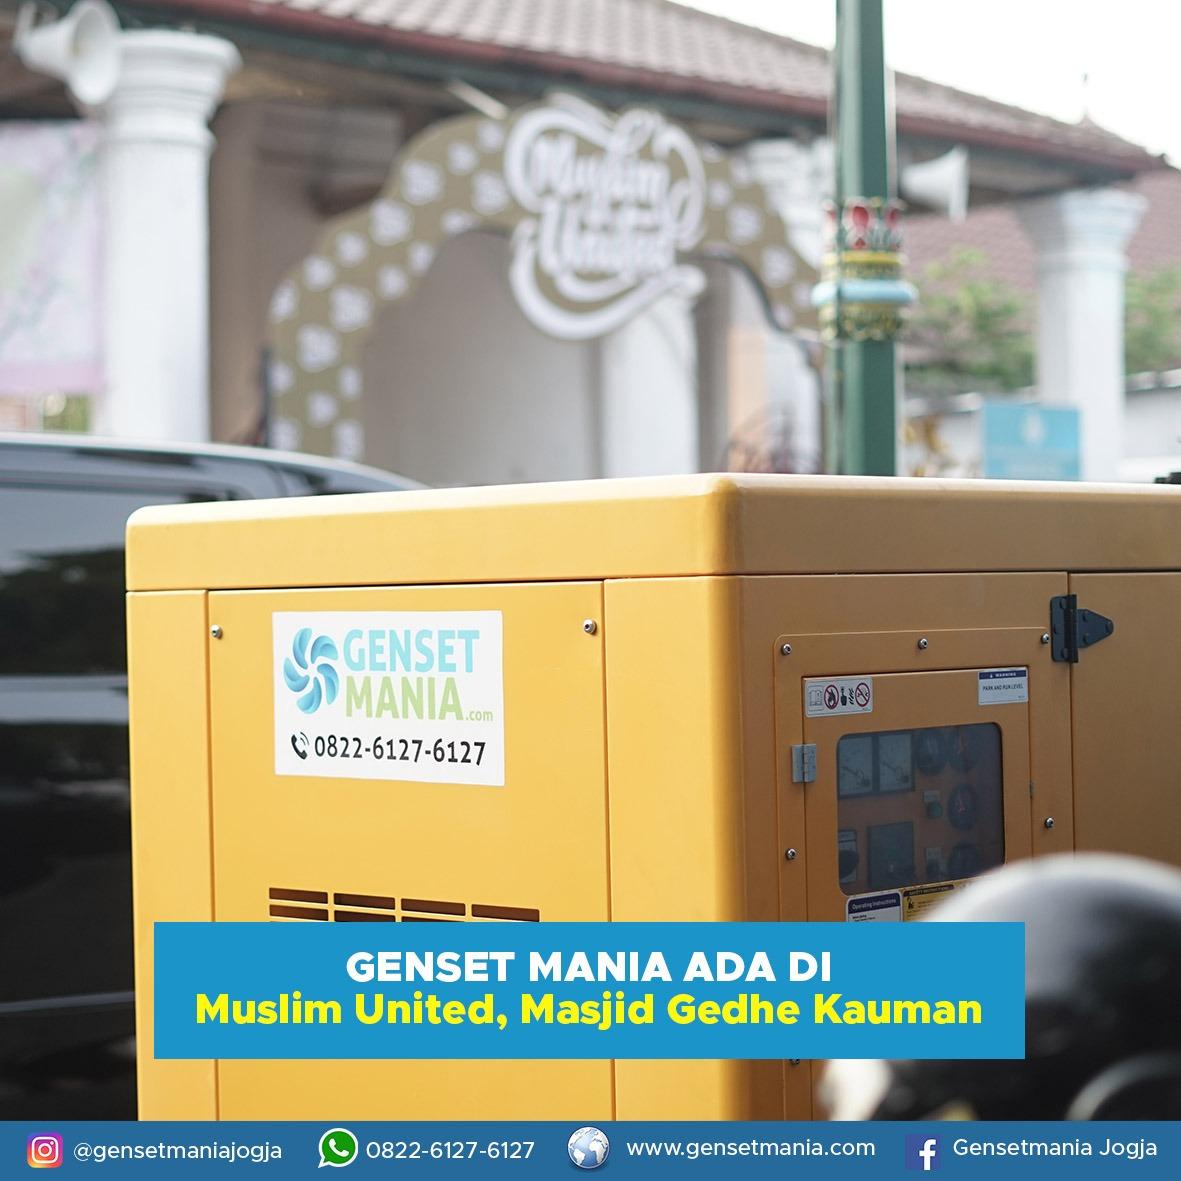 Sewa Genset Gen Rosso In concert a Yogyakarta di toko GENSETMANIA SEWA GENSET JOGJA daerah Yogyakarta, DI Yogyakarta - Sewa menyewa jadi lebih mudah di Spotsewa